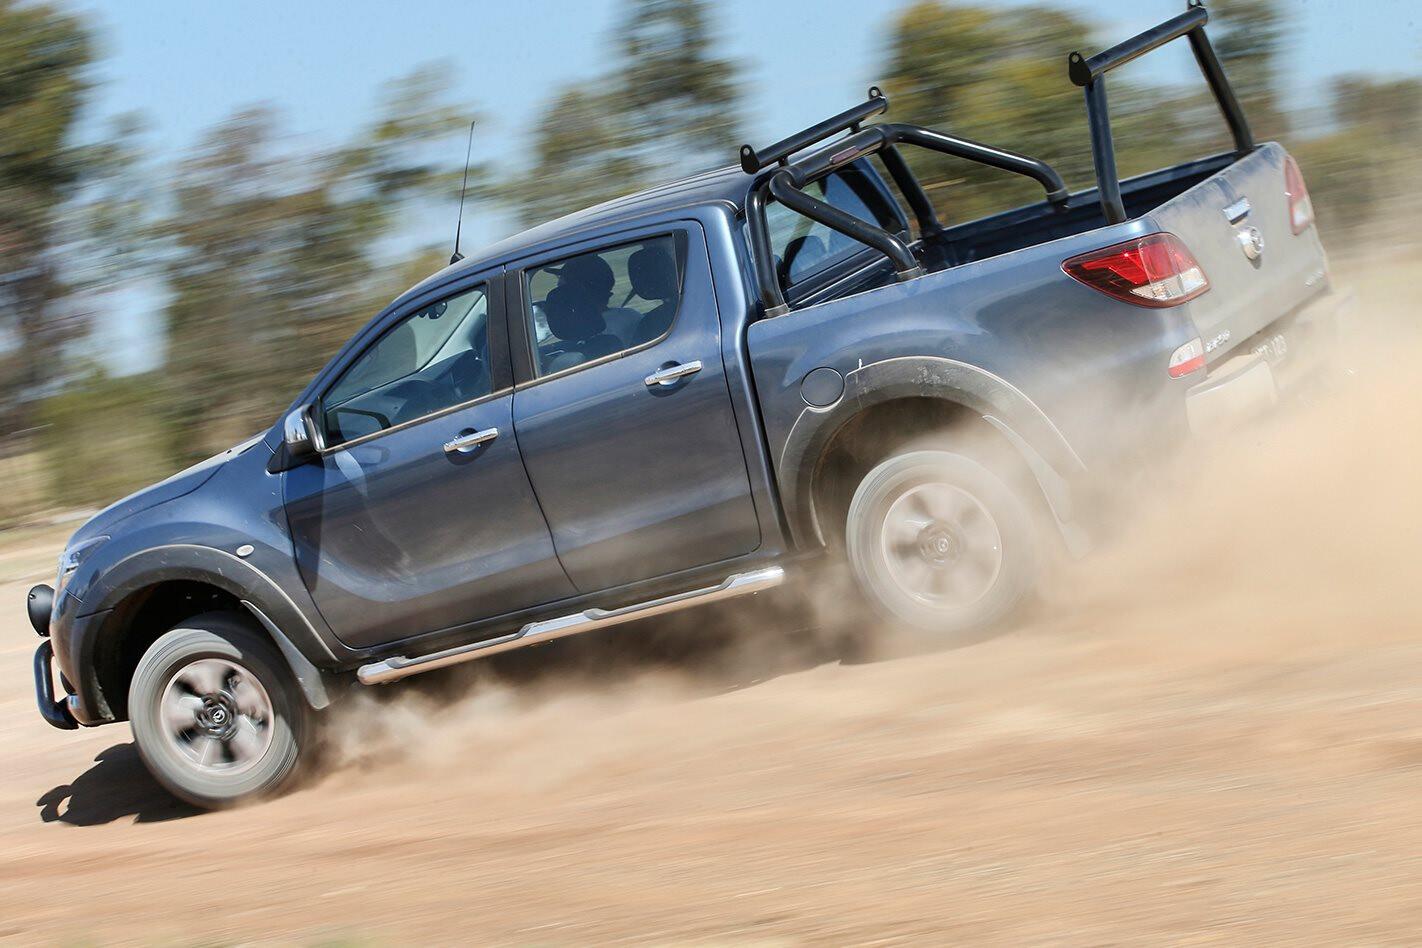 Mazda BT 50 Side Driving Dirt Jpg